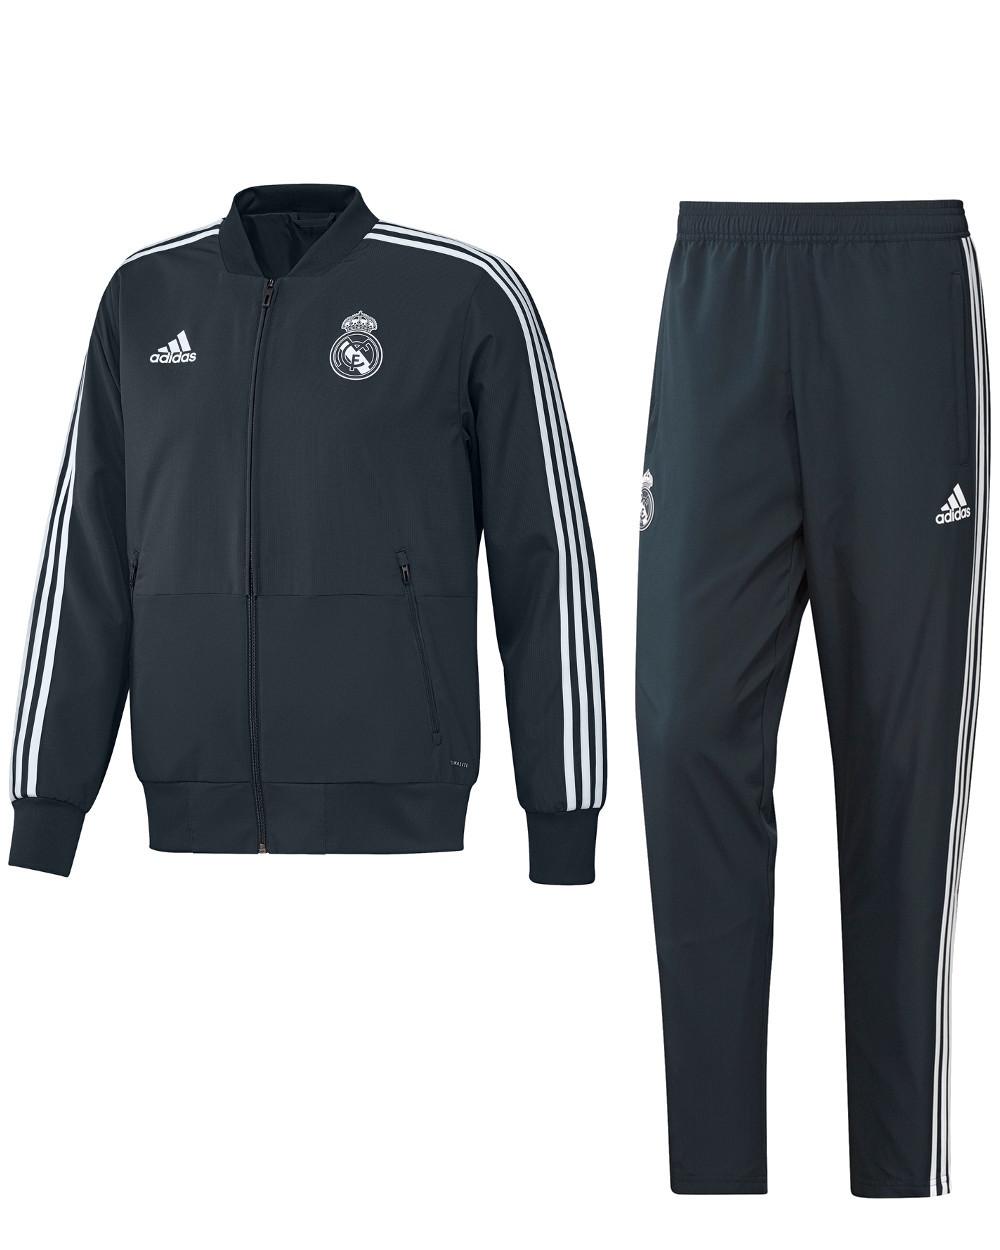 Real Madrid Adidas Tuta Rappresentanza Pres Tracksuit 2018 19 Woven azul